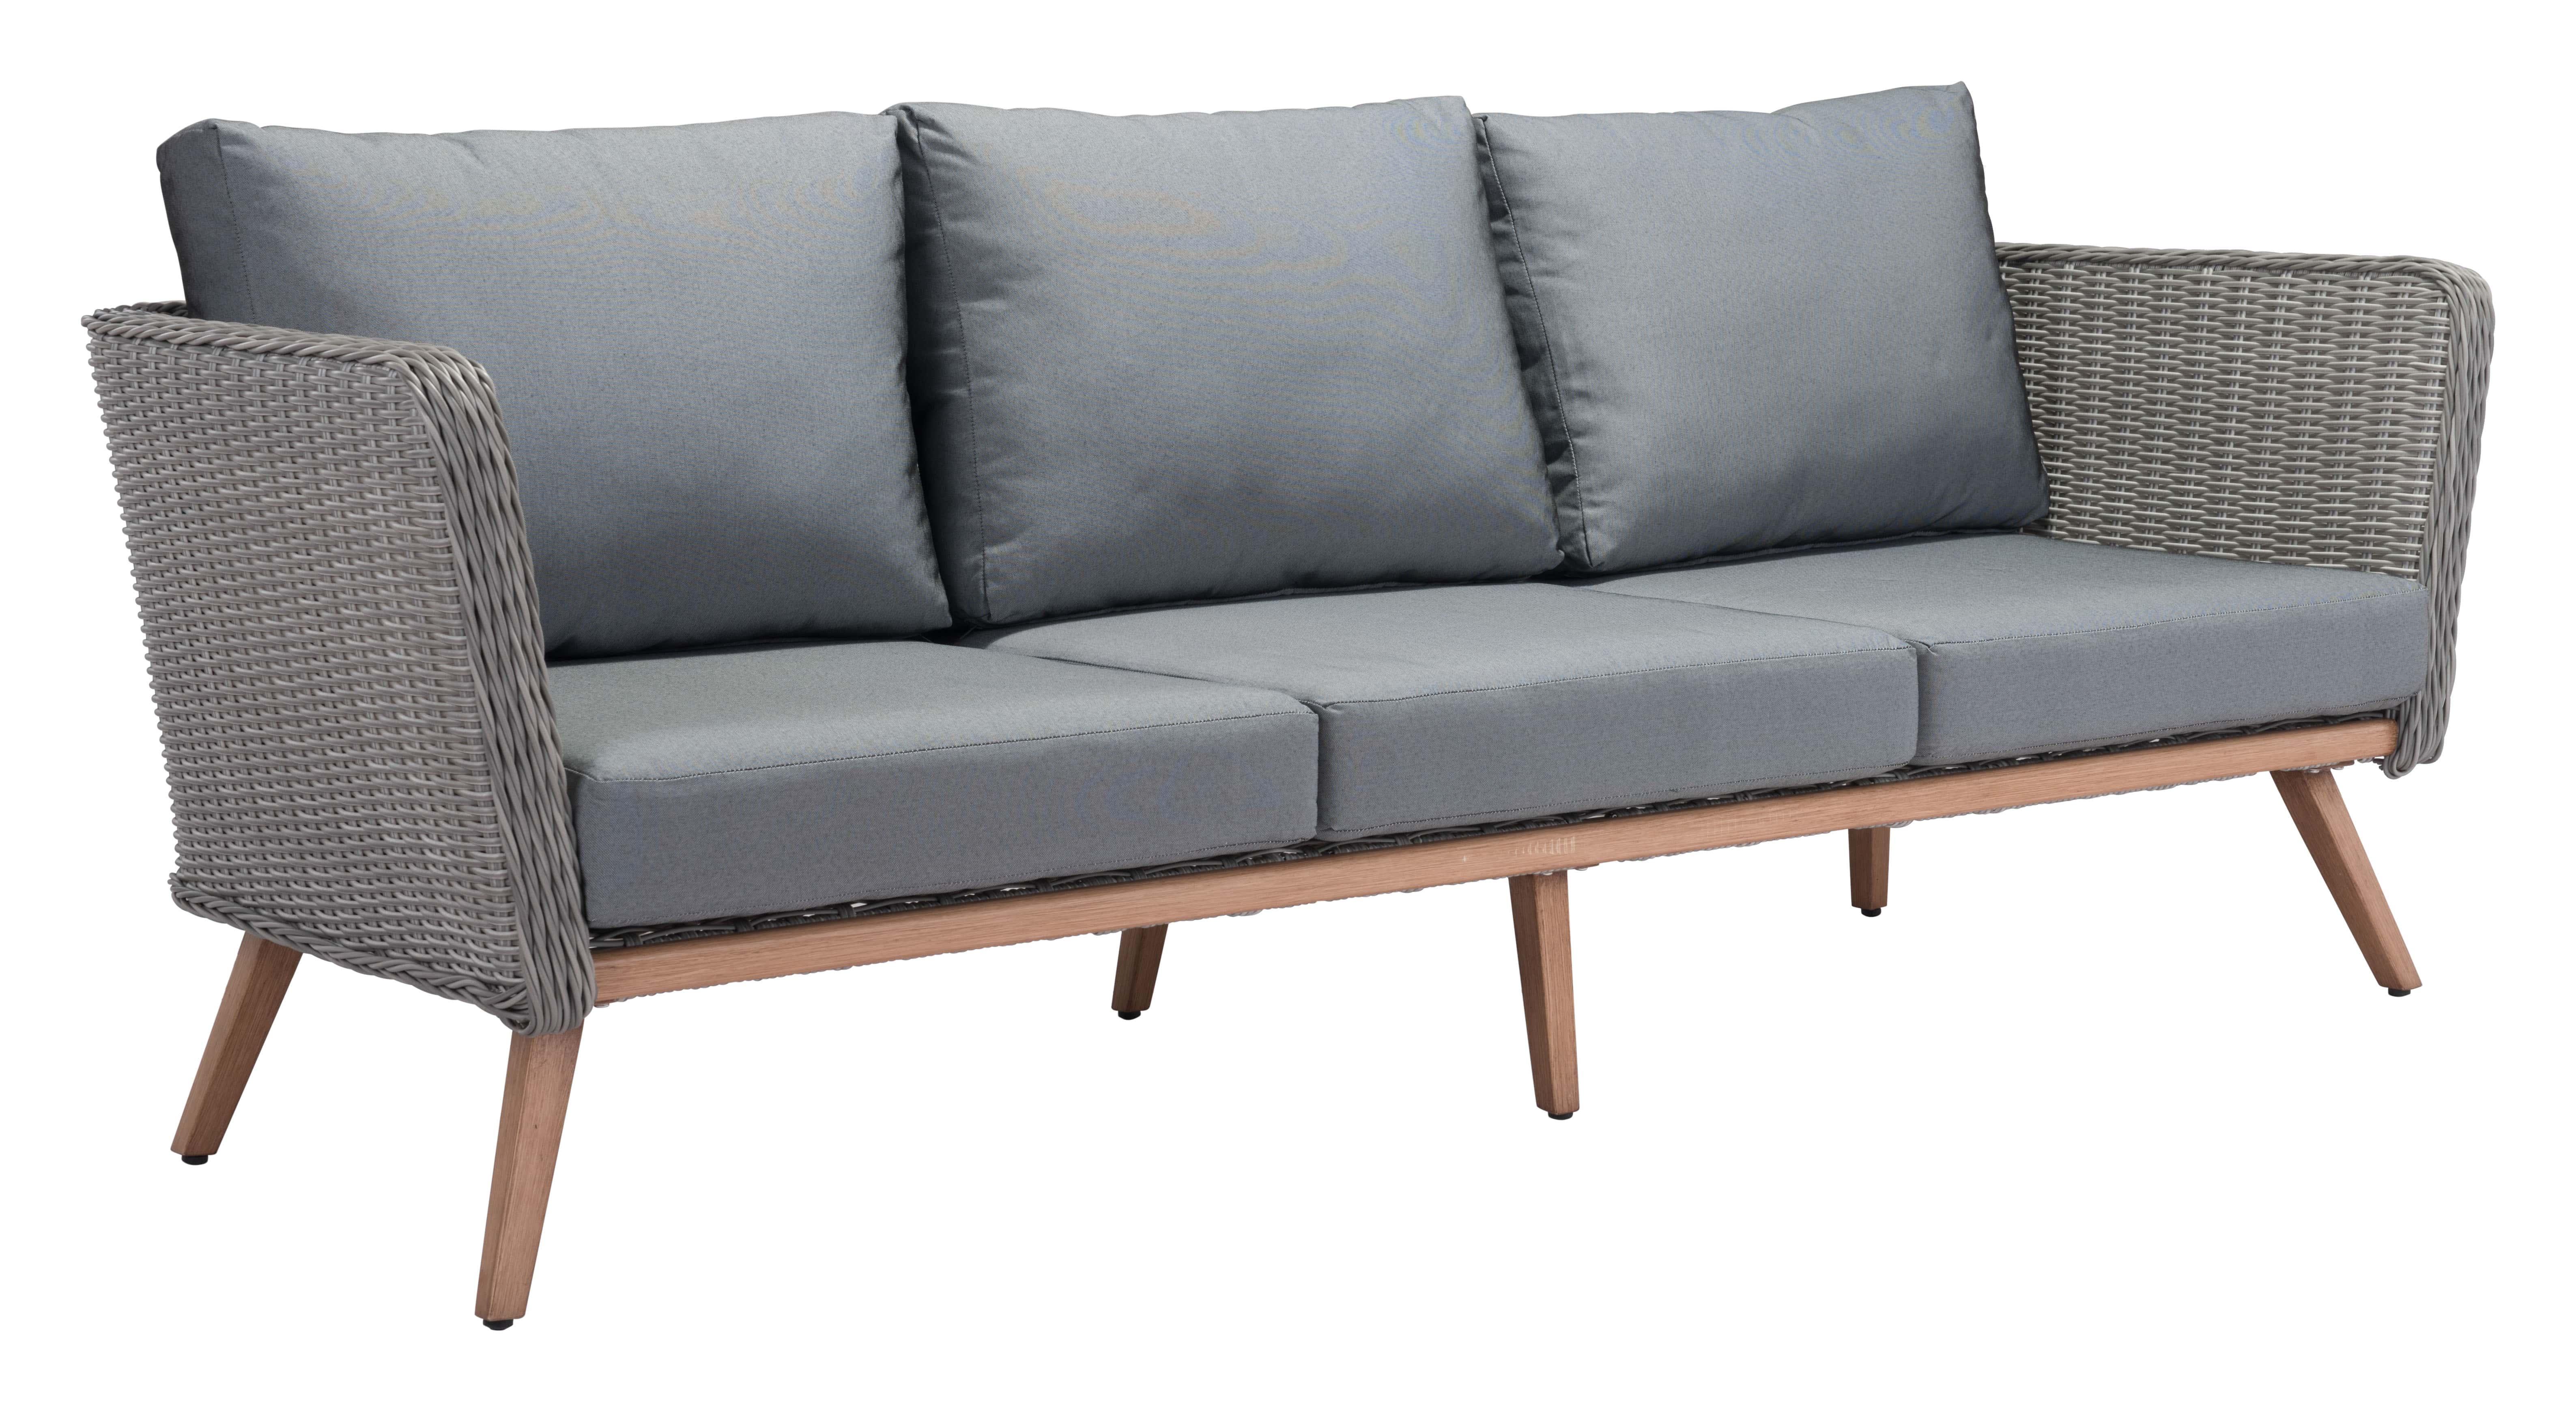 Pleasant Monaco Sofa Natural Gray By Zuo Modern Dailytribune Chair Design For Home Dailytribuneorg